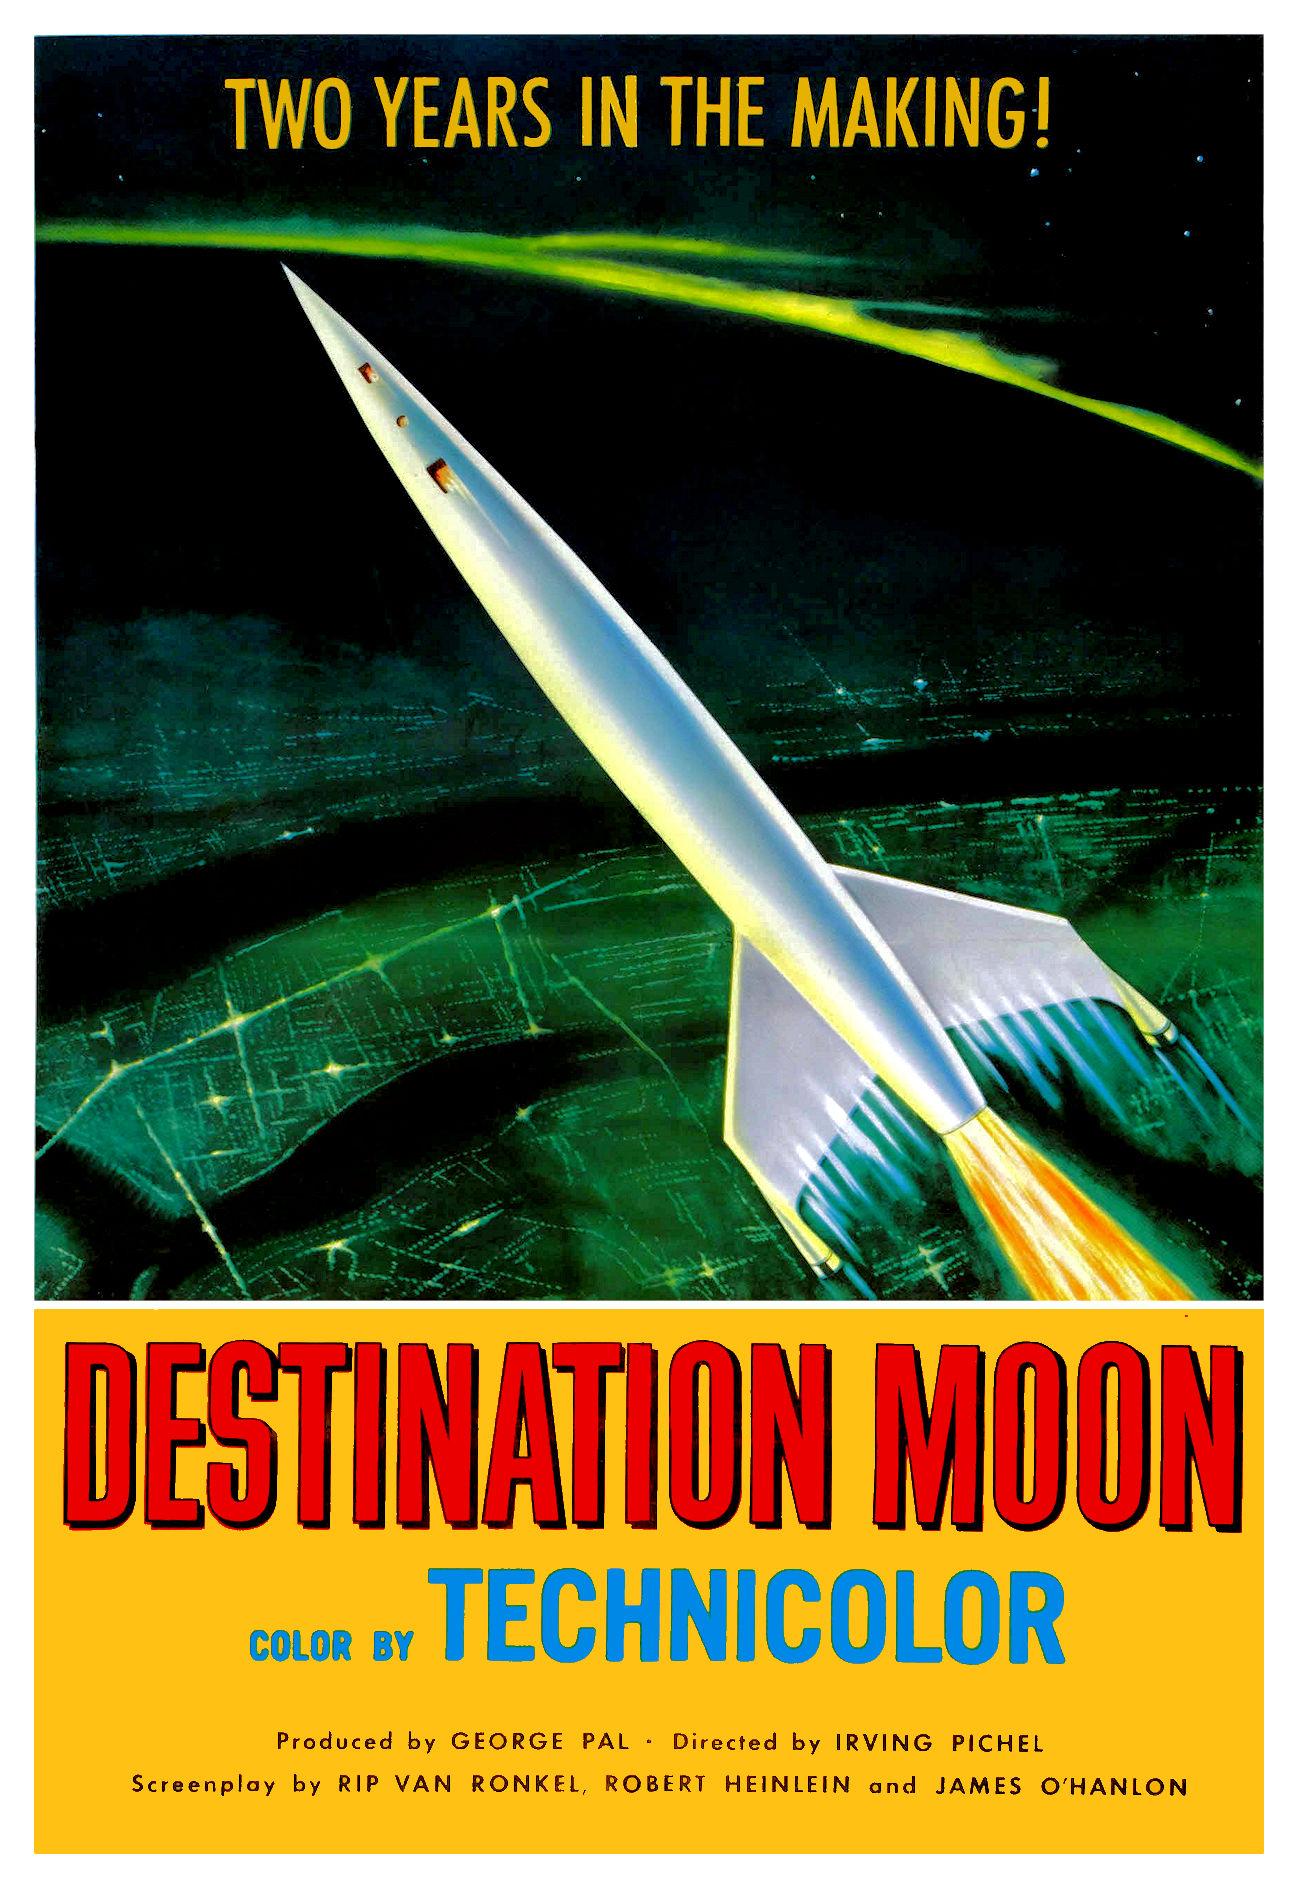 Destination Moon image 02